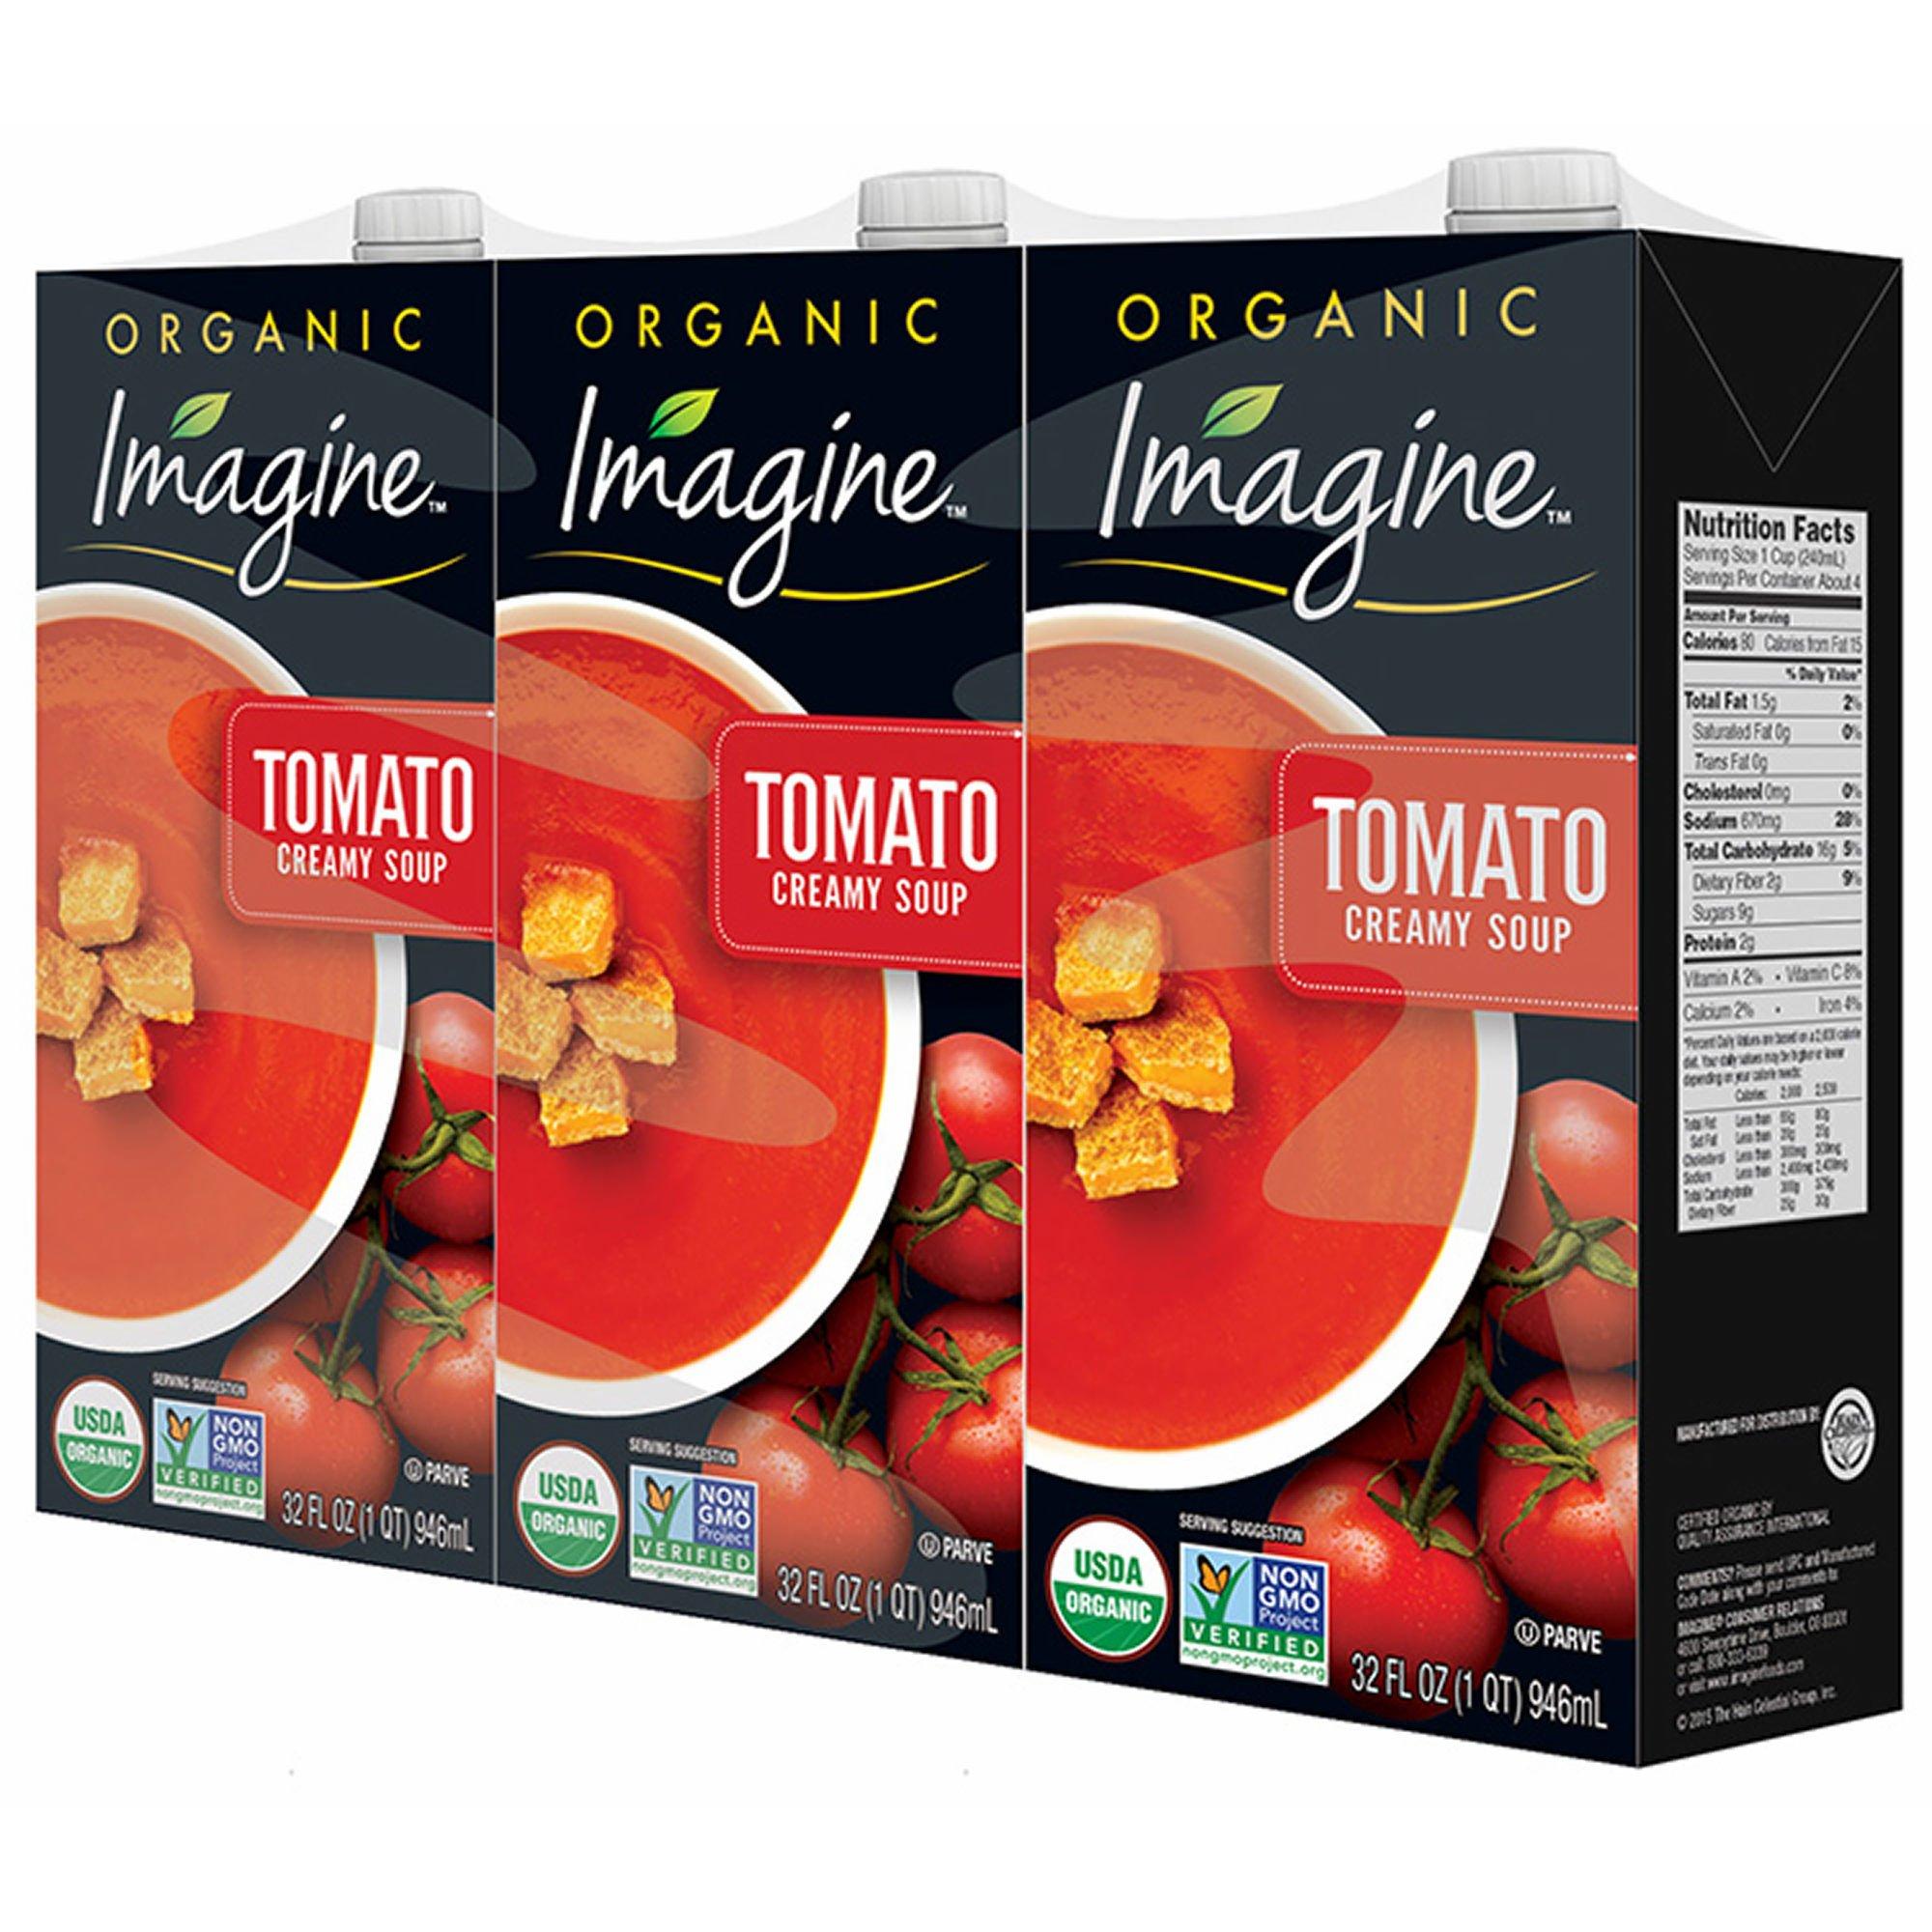 Imagine Organic Creamy Tomato Soup, 3 pk./32 oz. (pack of 2)